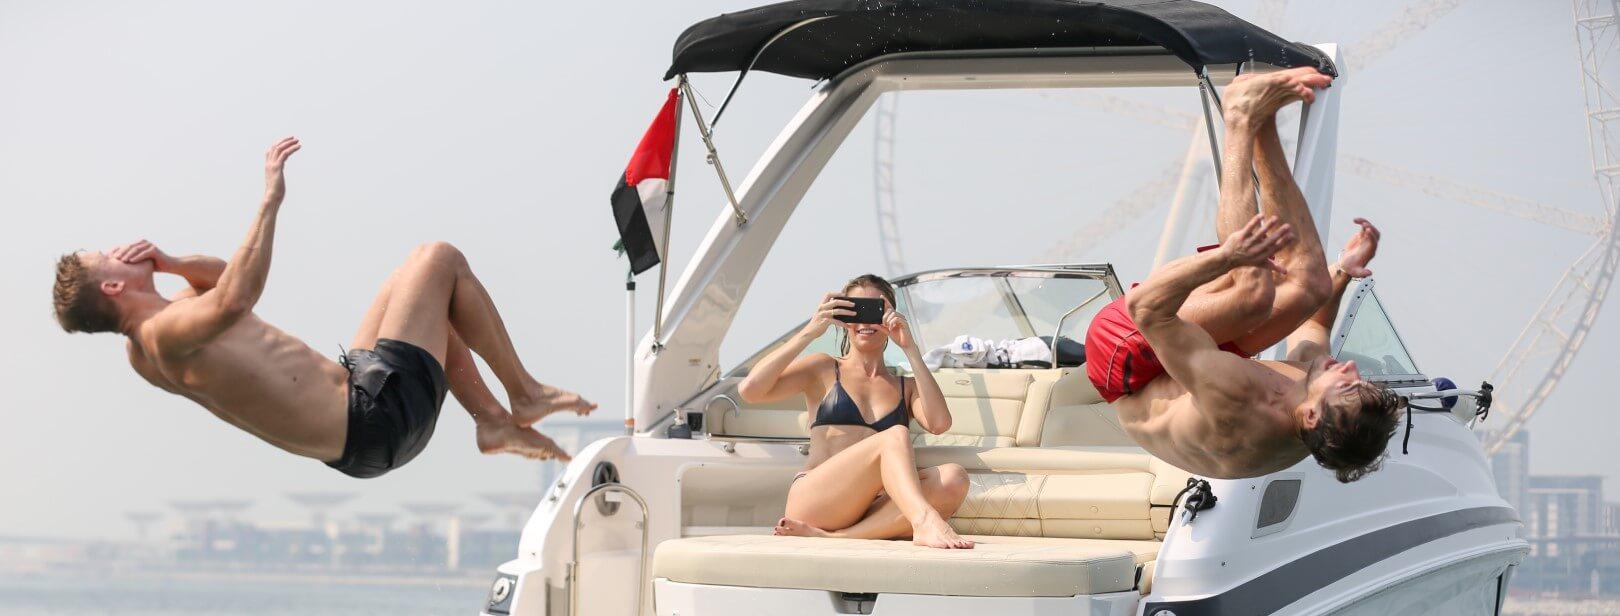 Compare Boat Clubs